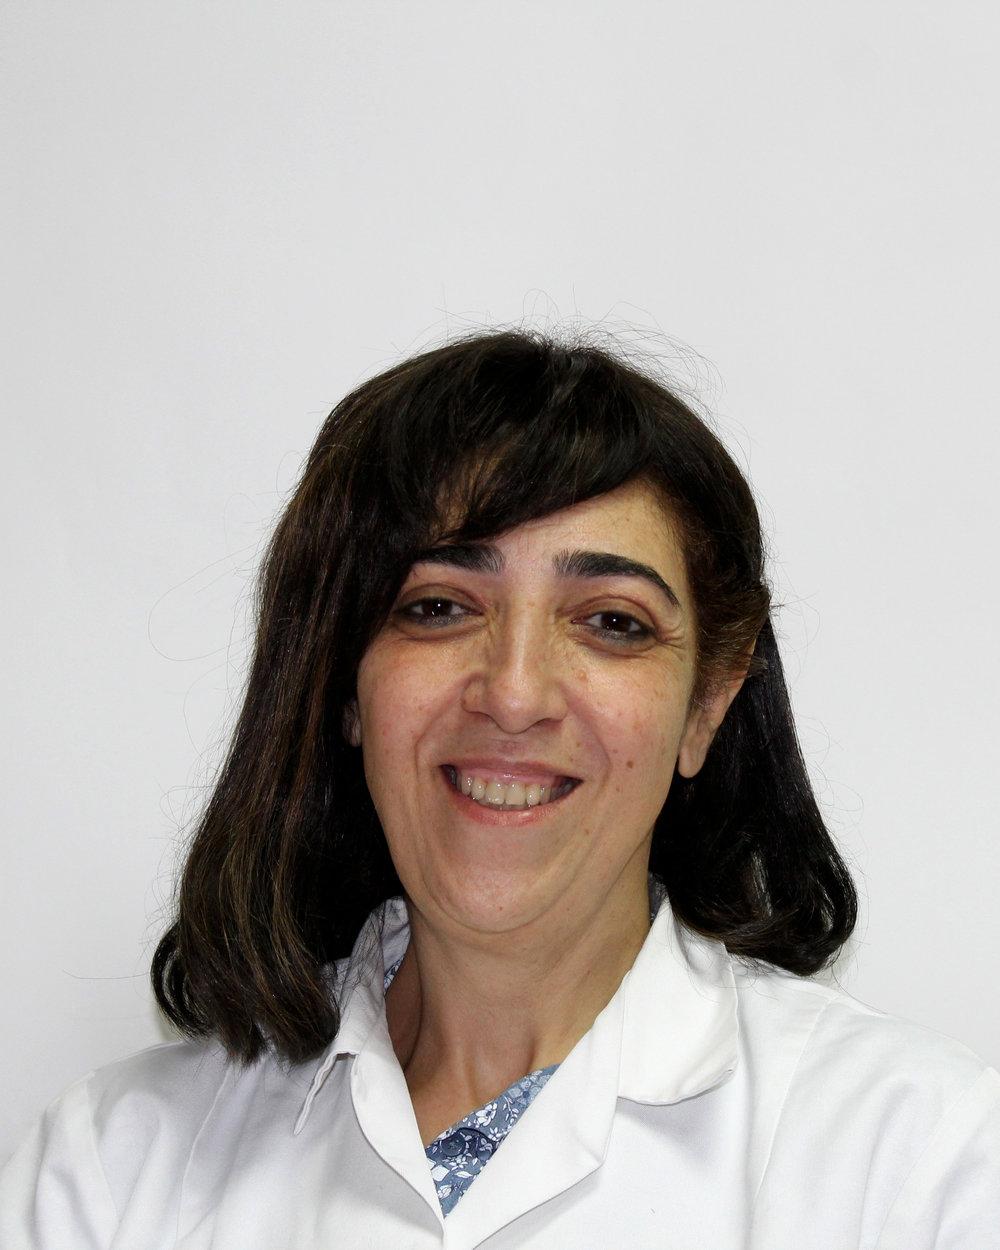 Dr. Dina A. mONIEM General Manager